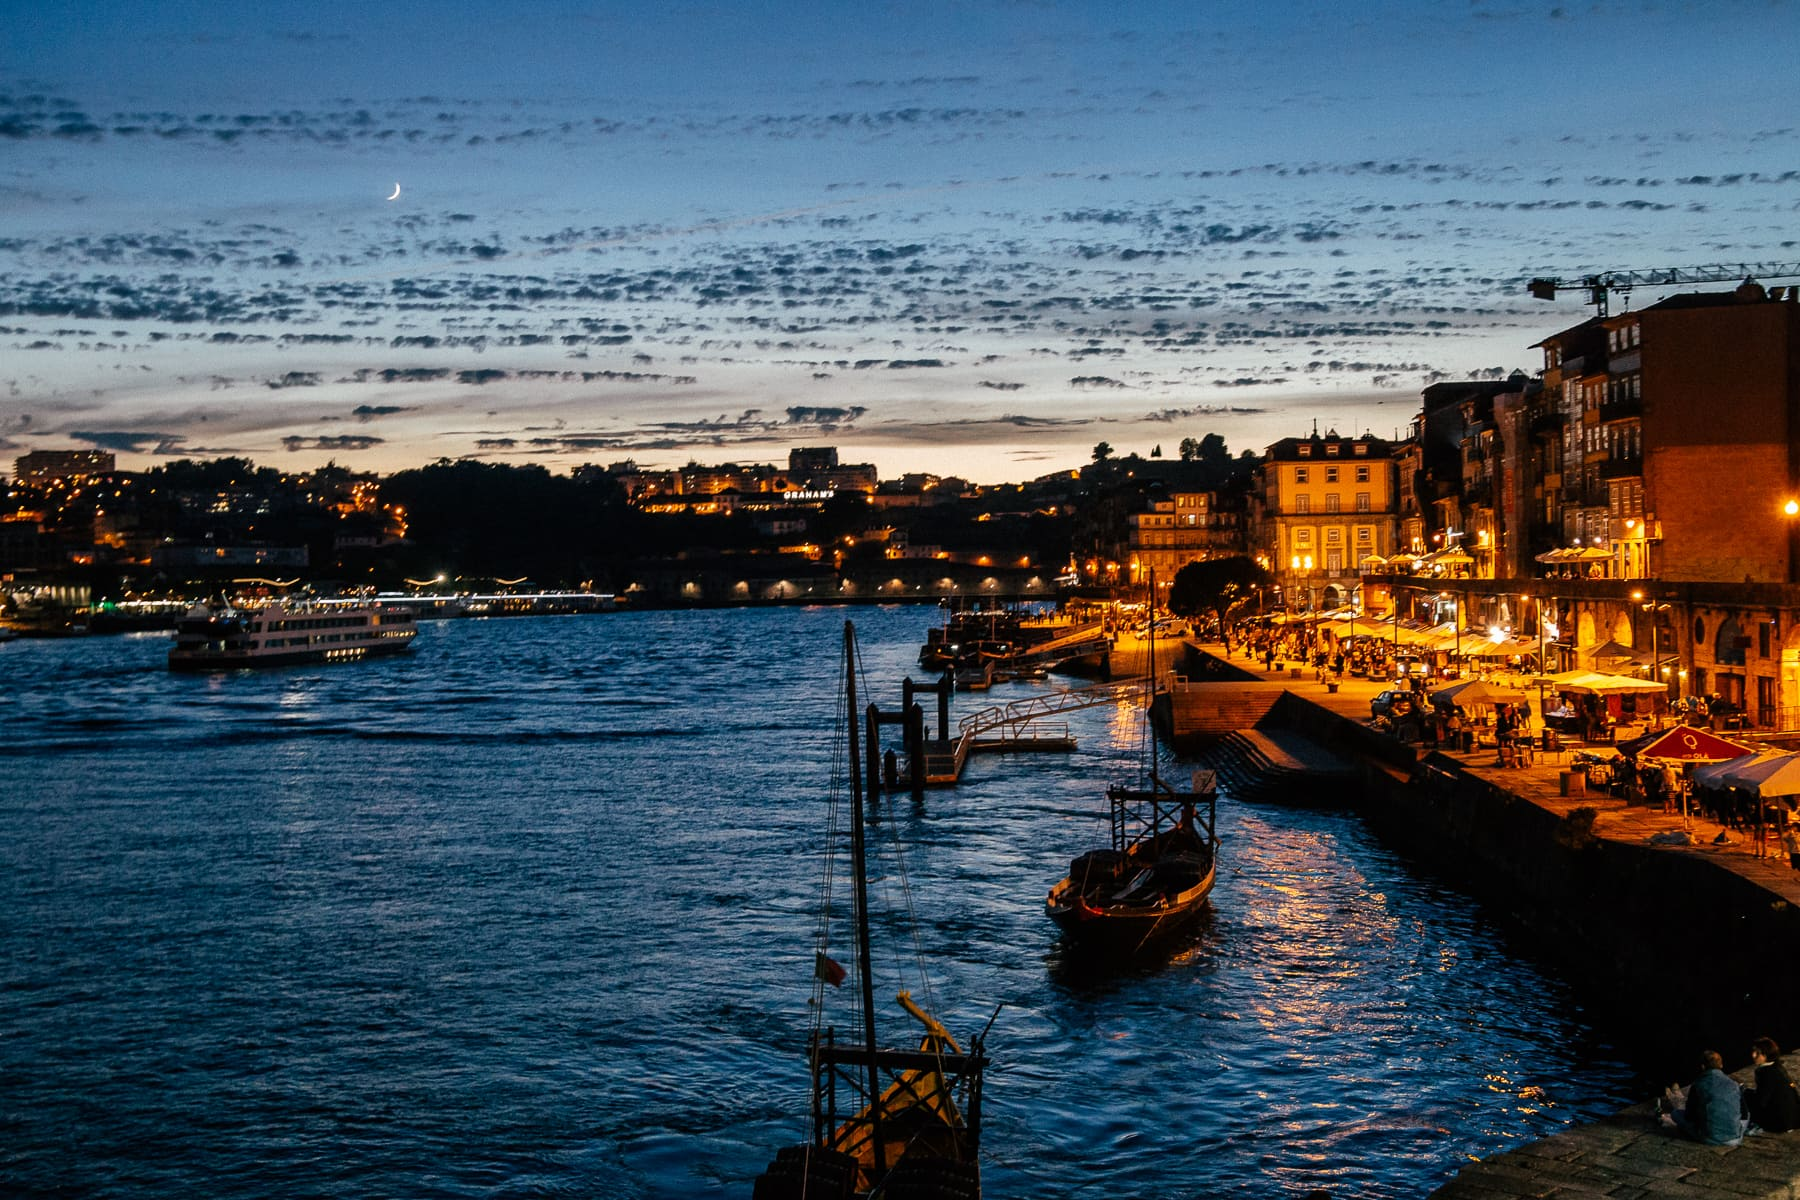 zehn-porto-tipps-fuer-deine-staedtereise-in-portugal-reiseblog-des-belles-choses 33